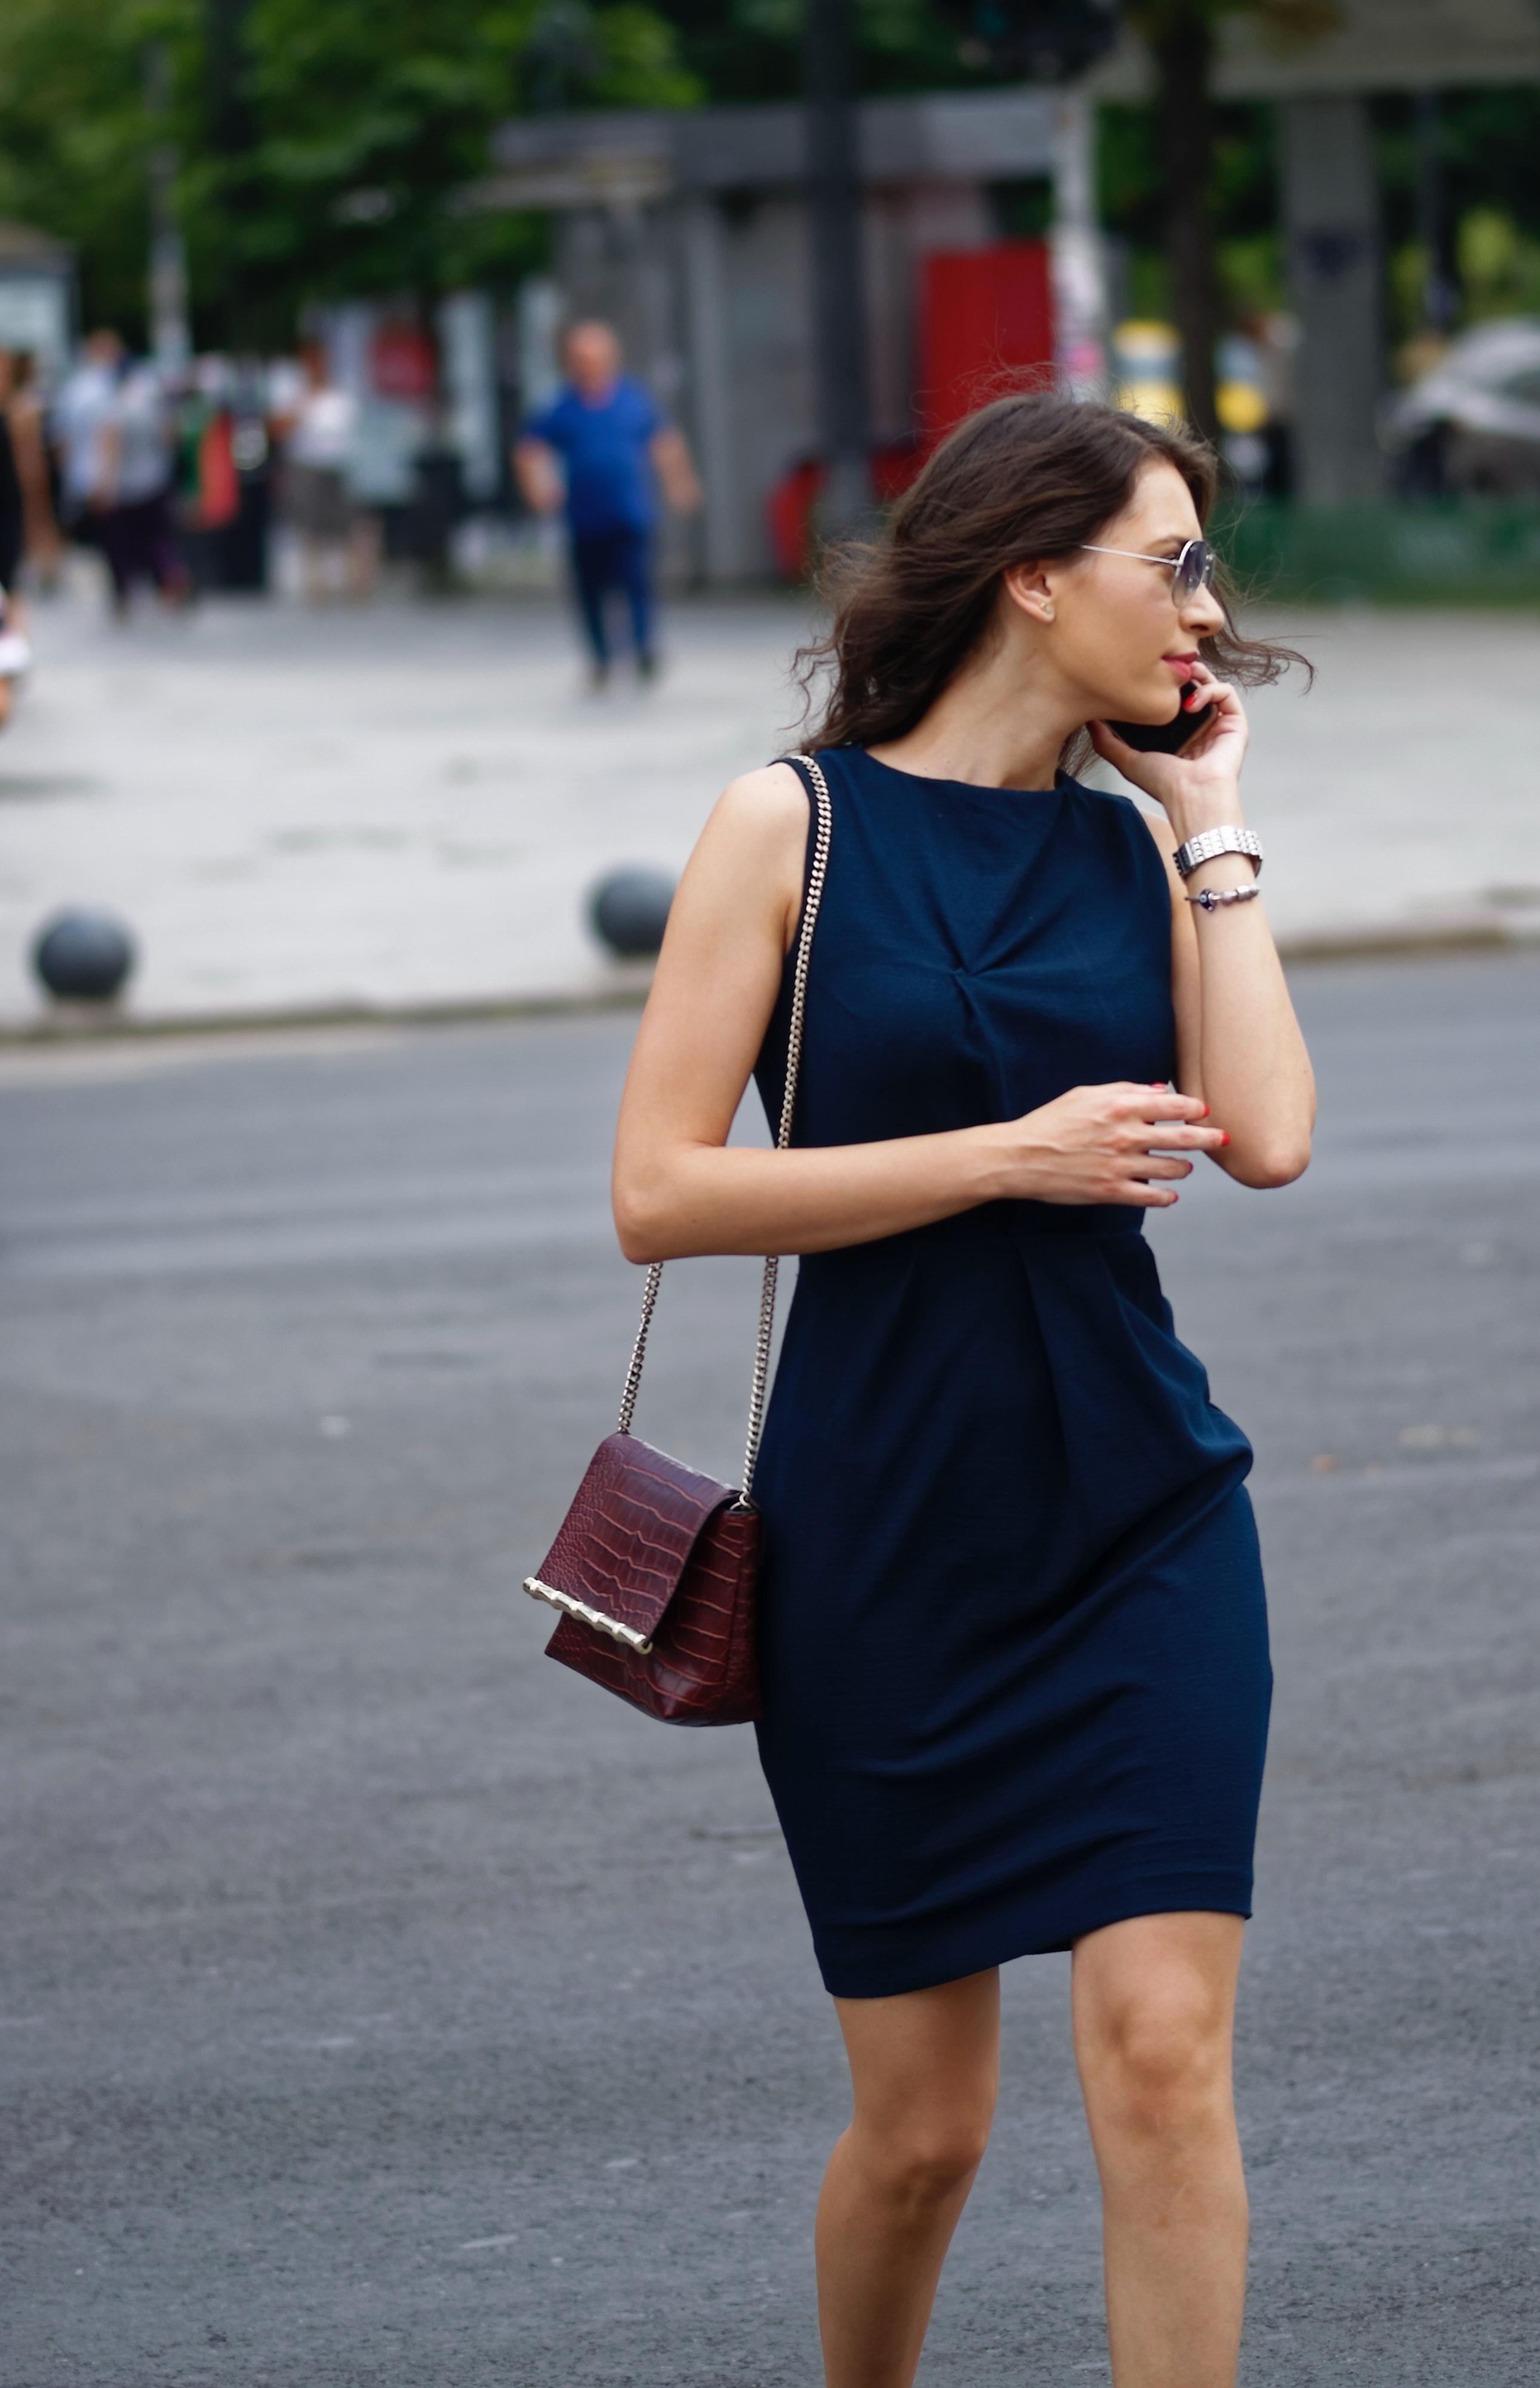 a648c6a5a9a Woman Wearing Black Sleeveless Bodycon Mini Dress · Free Stock Photo